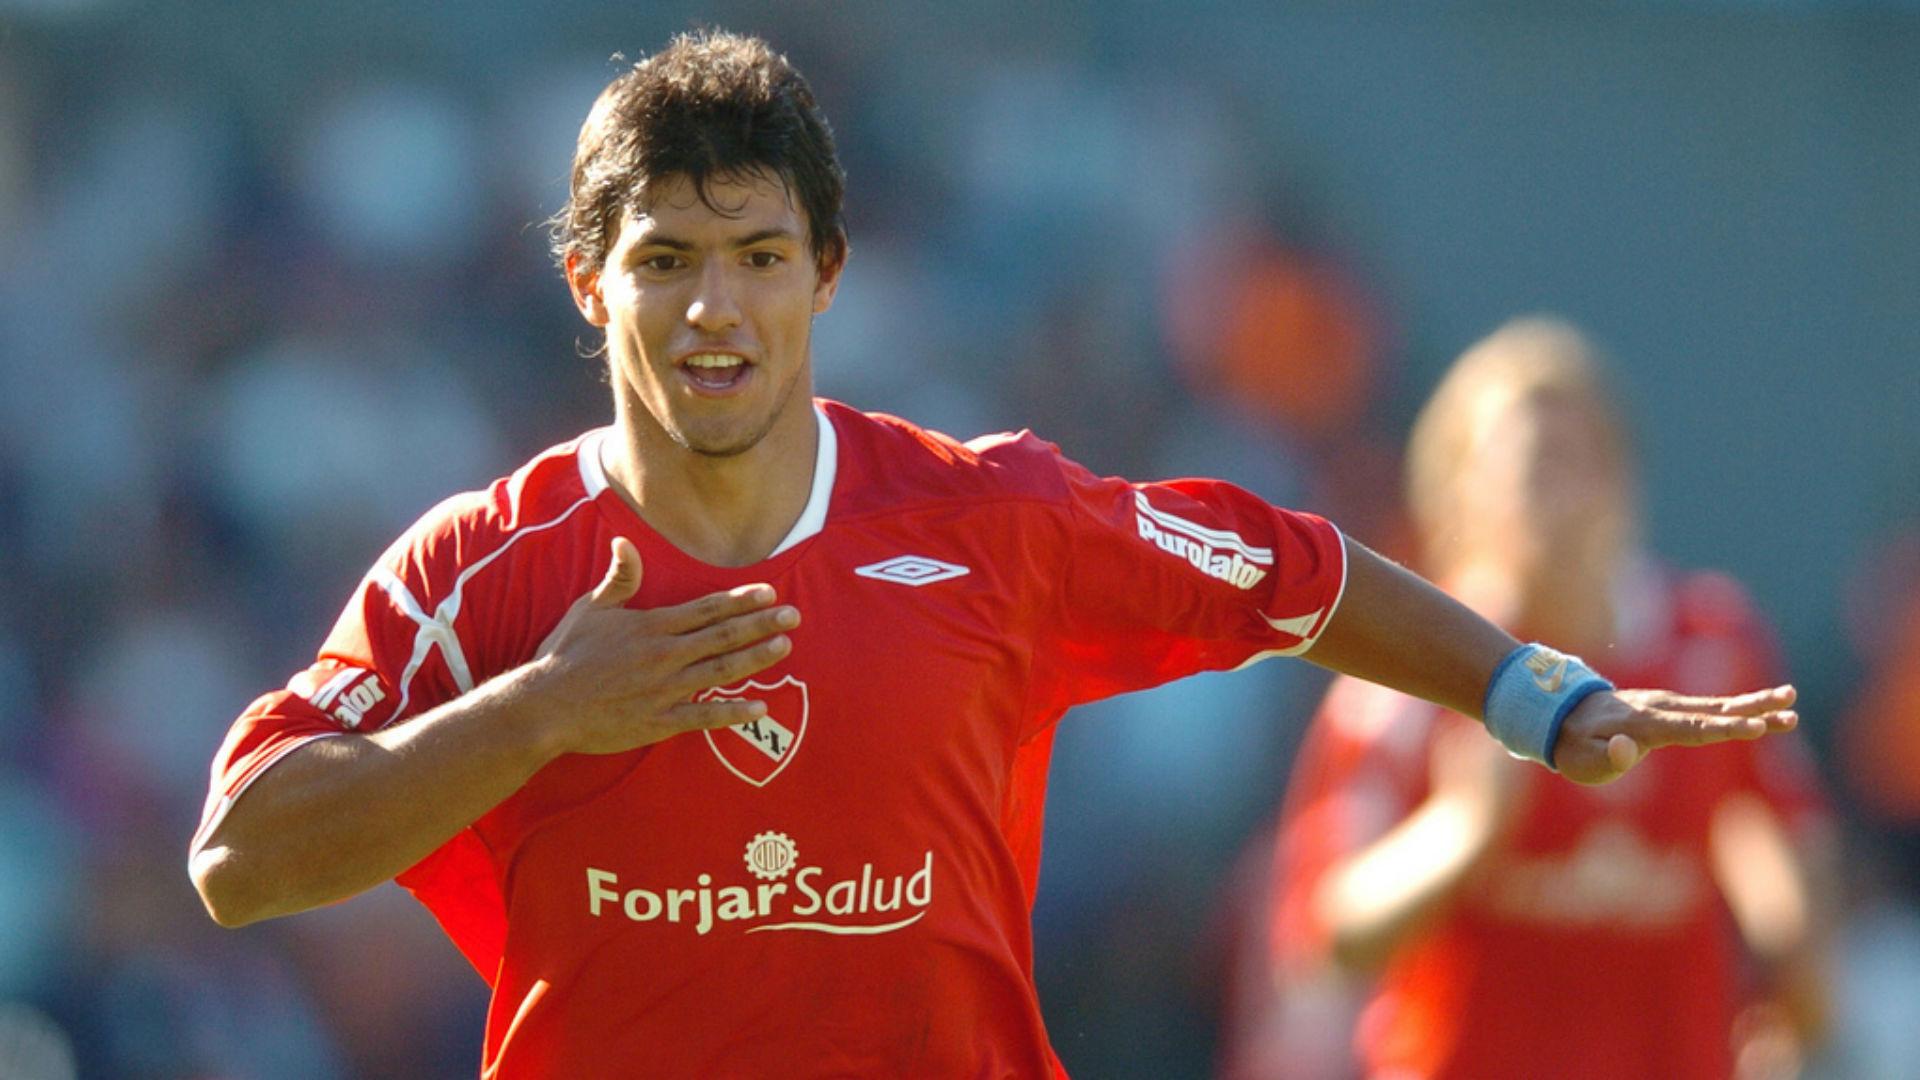 Sergio Agüero, Independiente - Goal.com